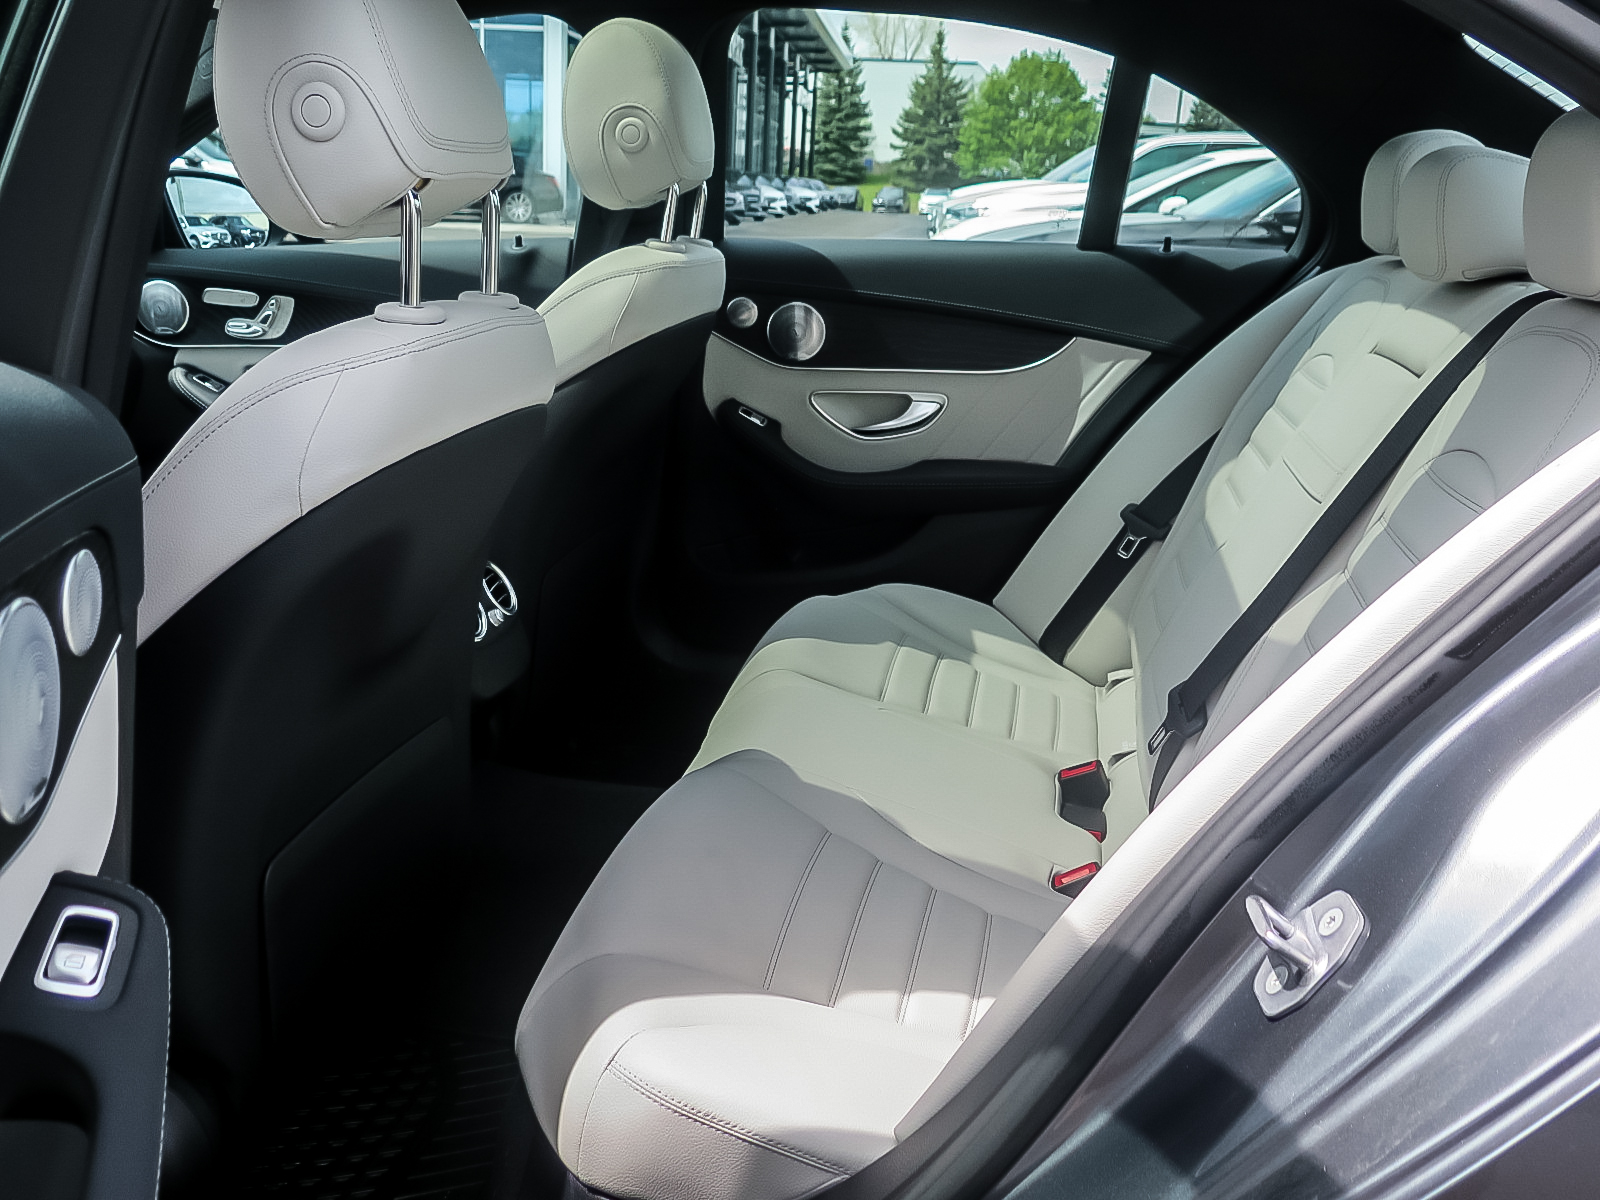 Certified Pre-Owned 2018 Mercedes-Benz C43 AMG 4MATIC Sedan